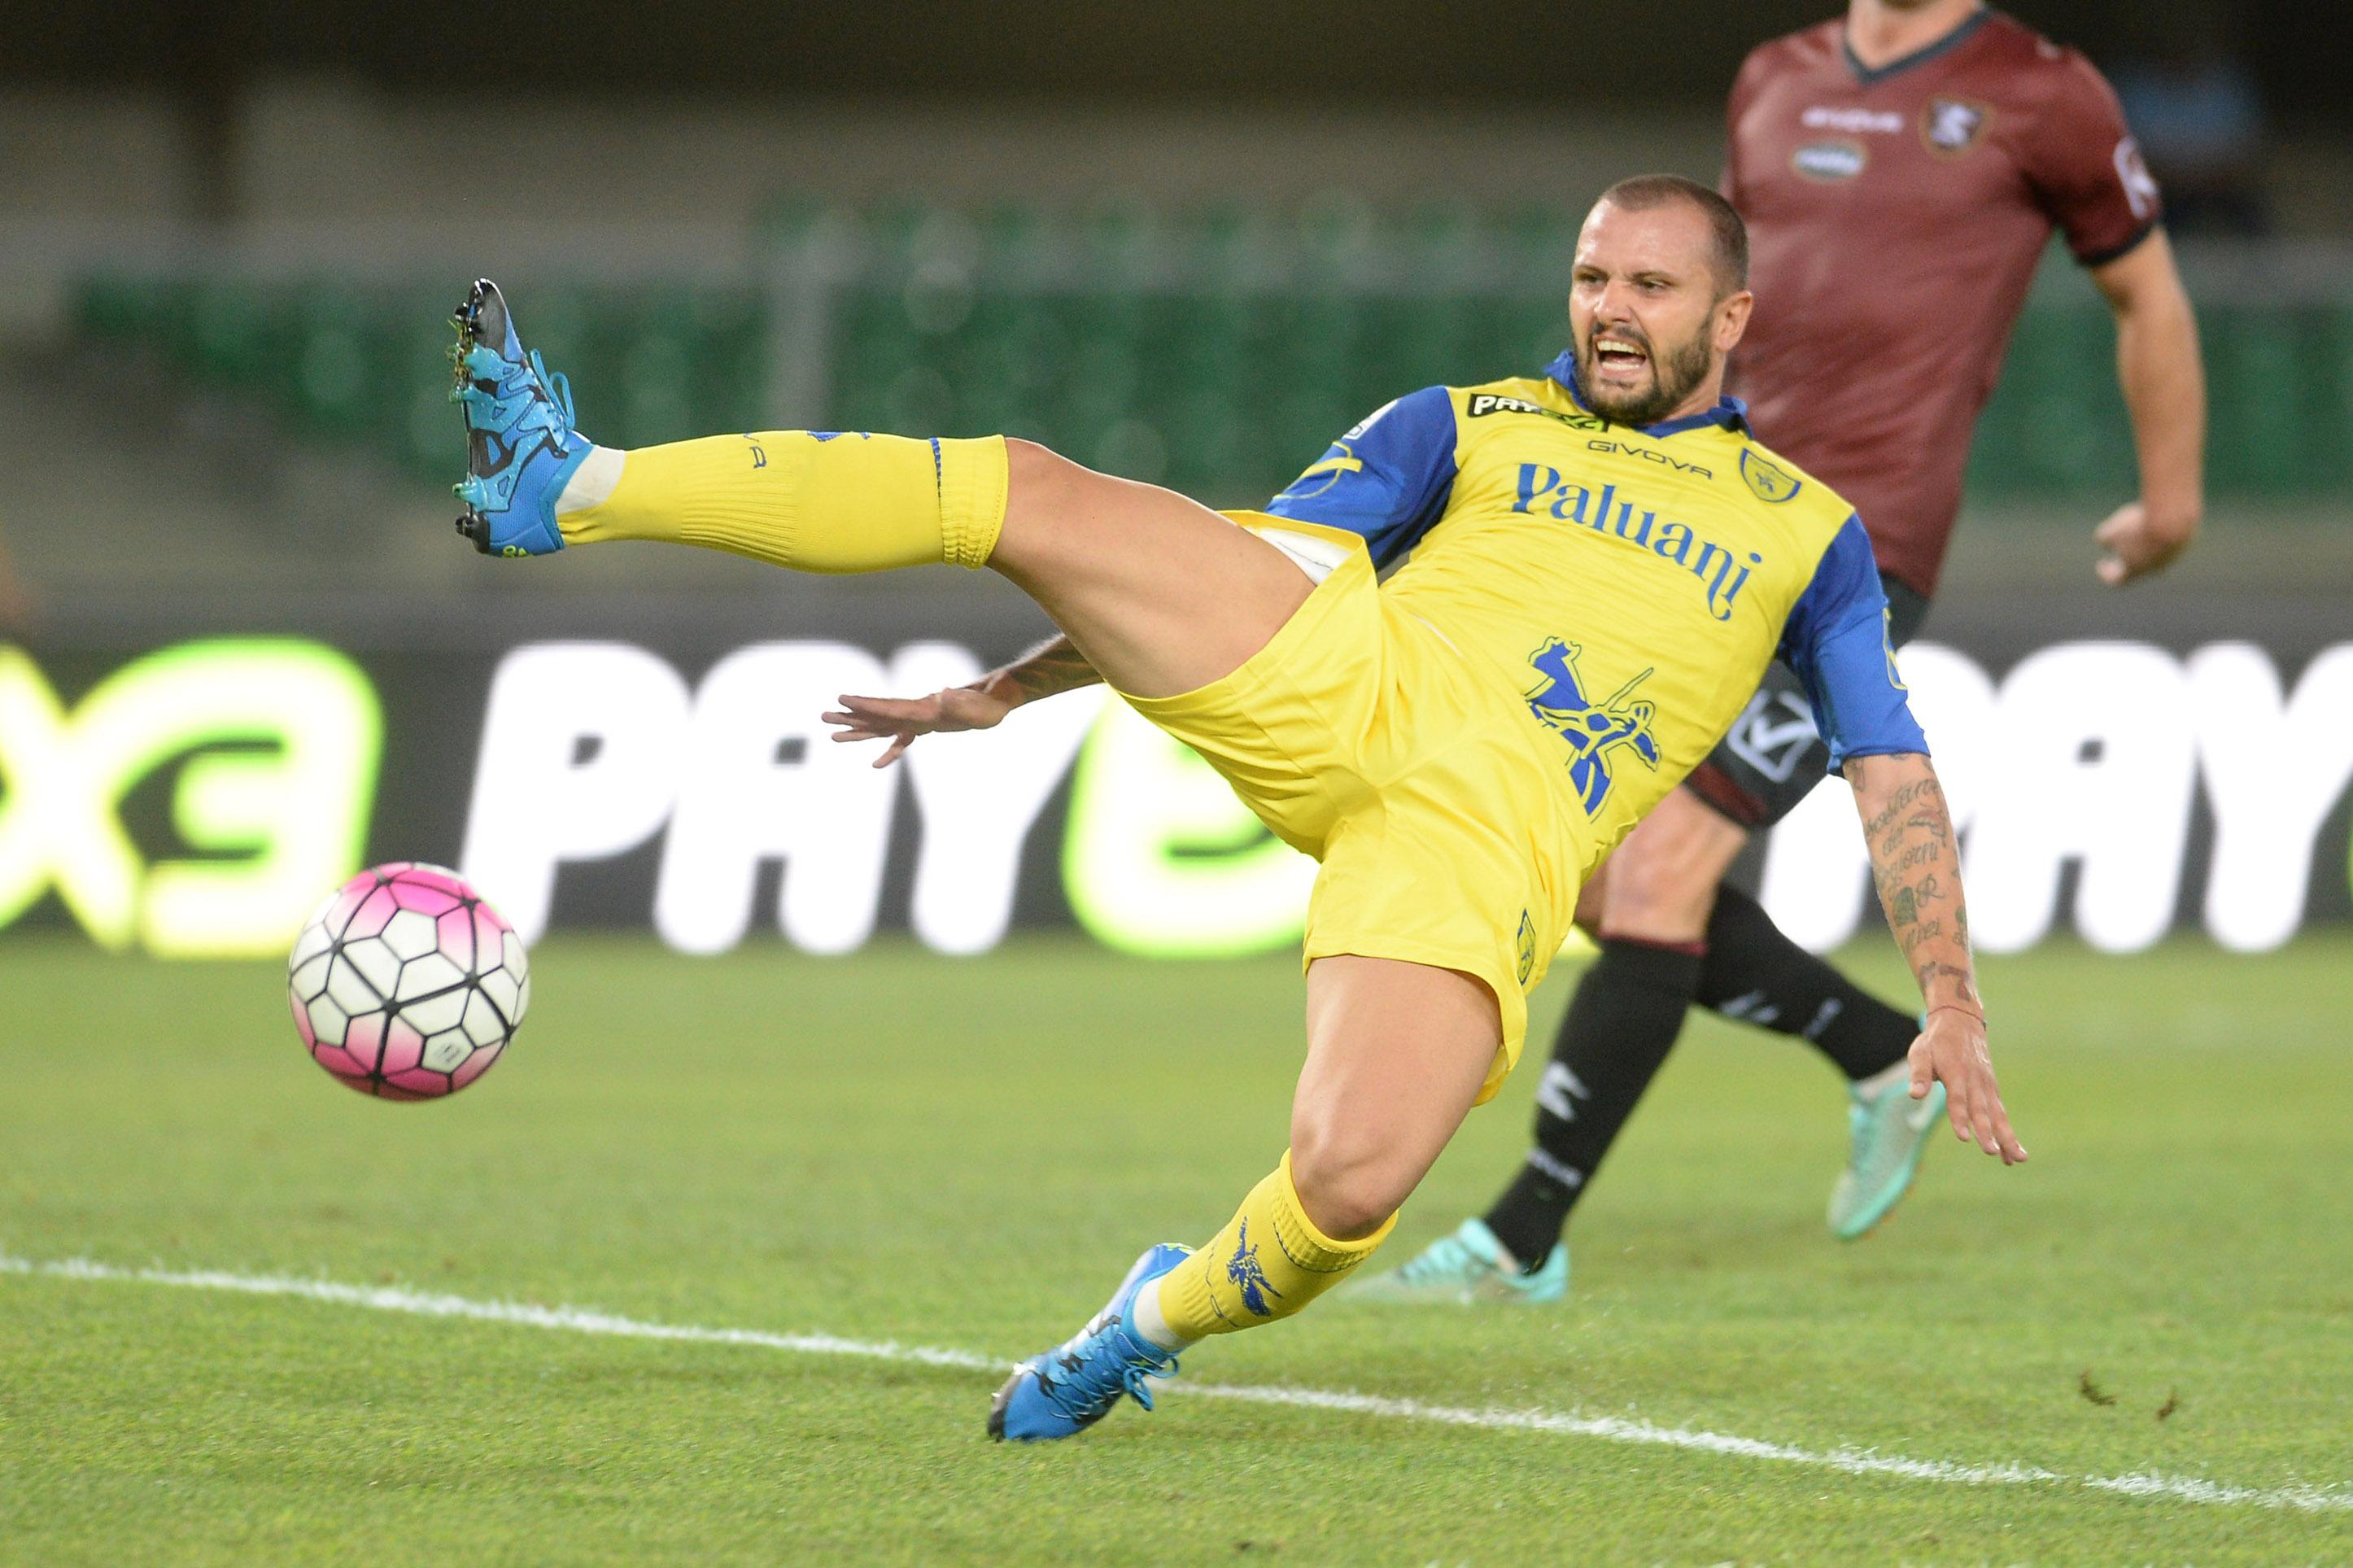 AC Chievo Verona v US Salernitana - TIM Cup